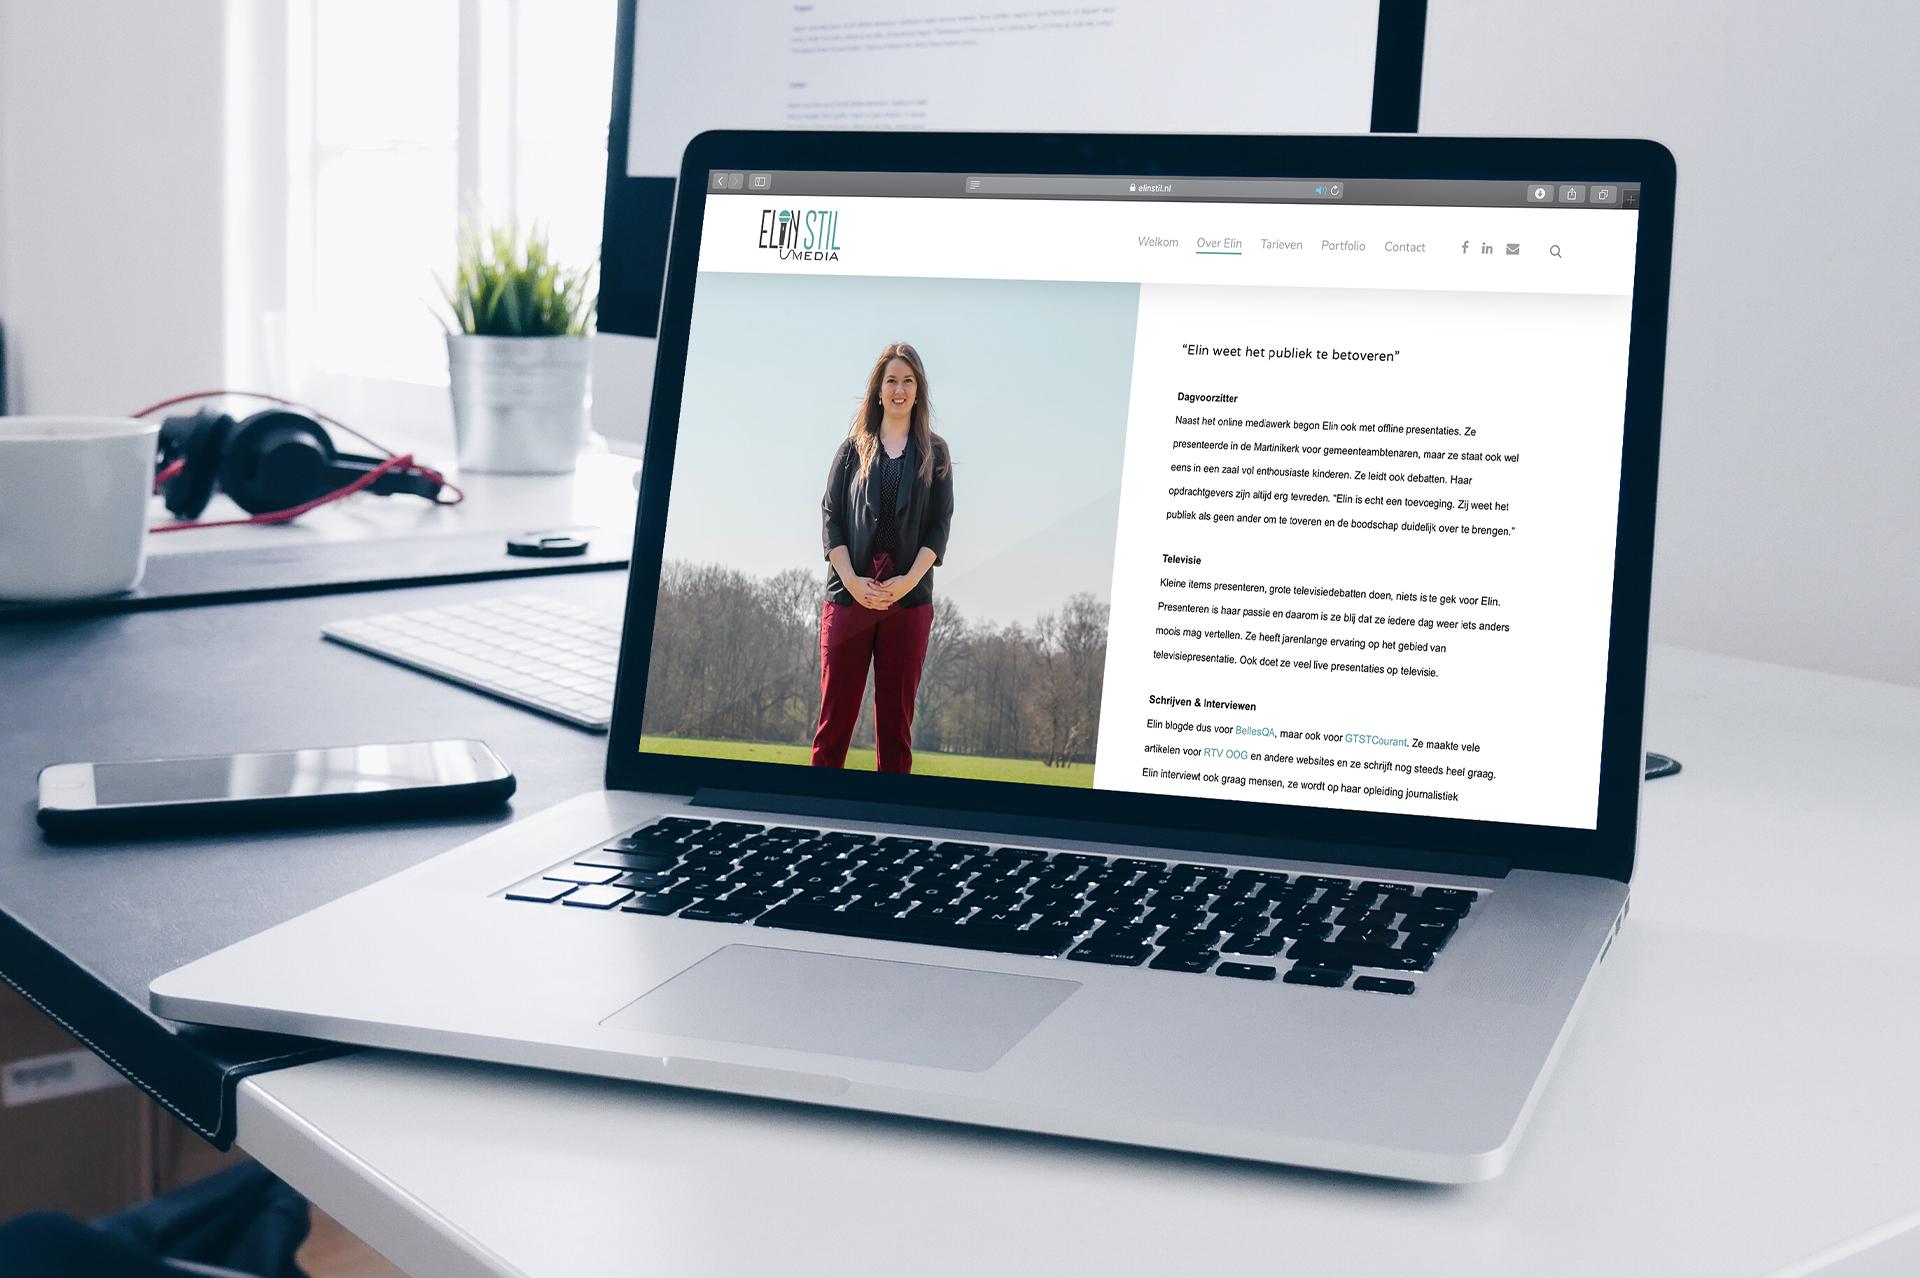 Website Elin Stil Media